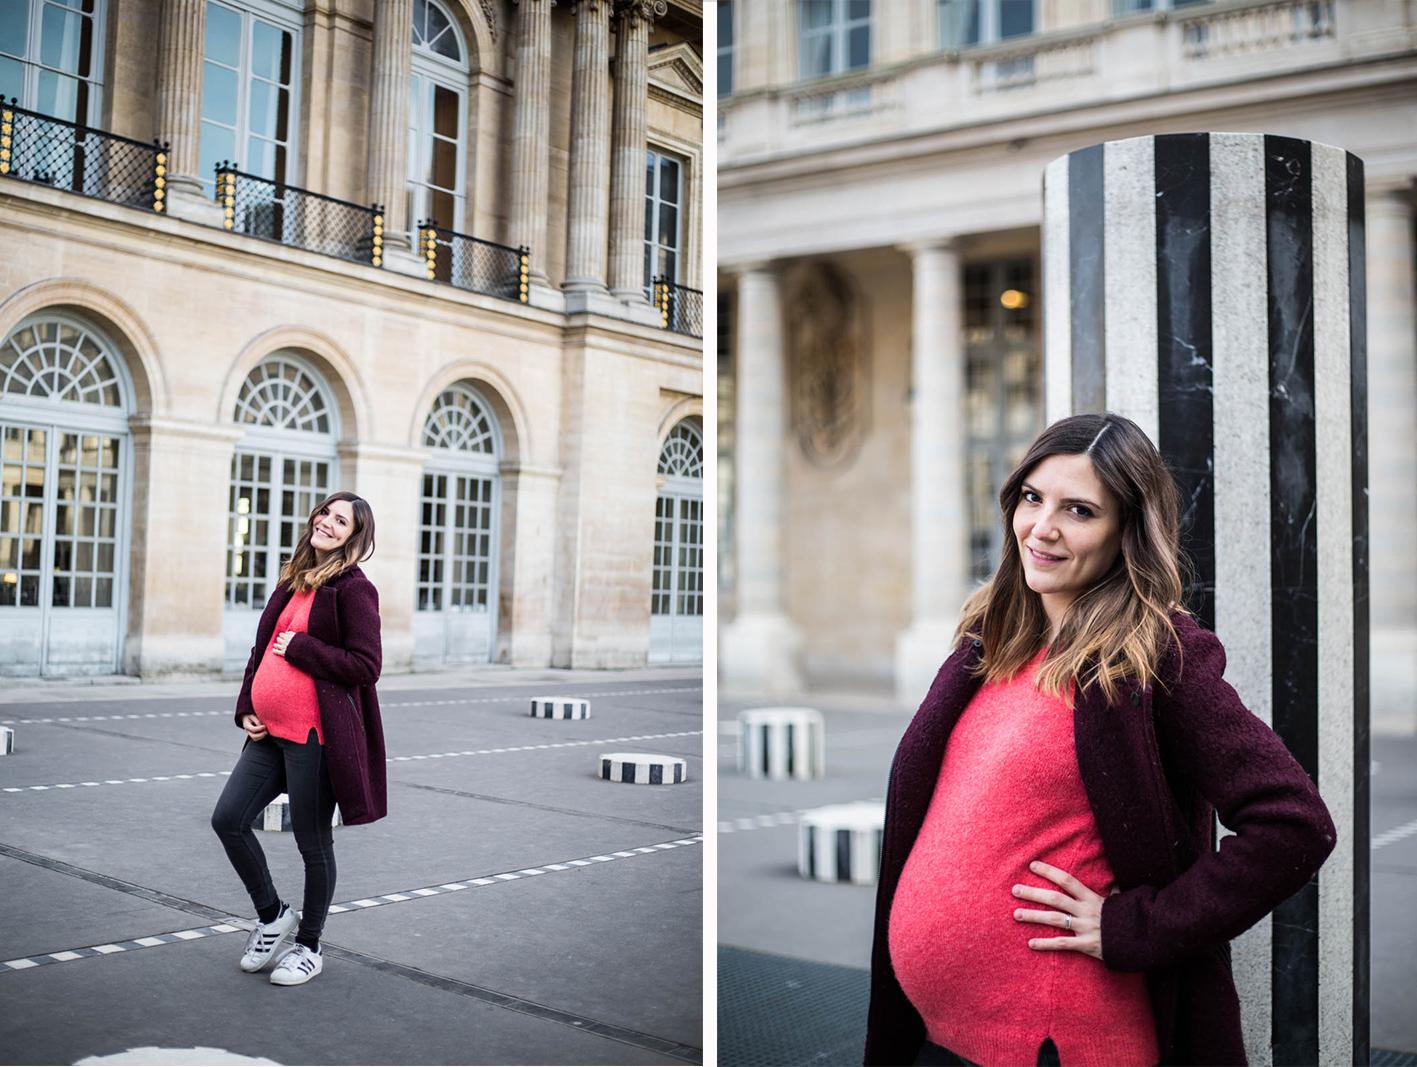 enceinte-34sa